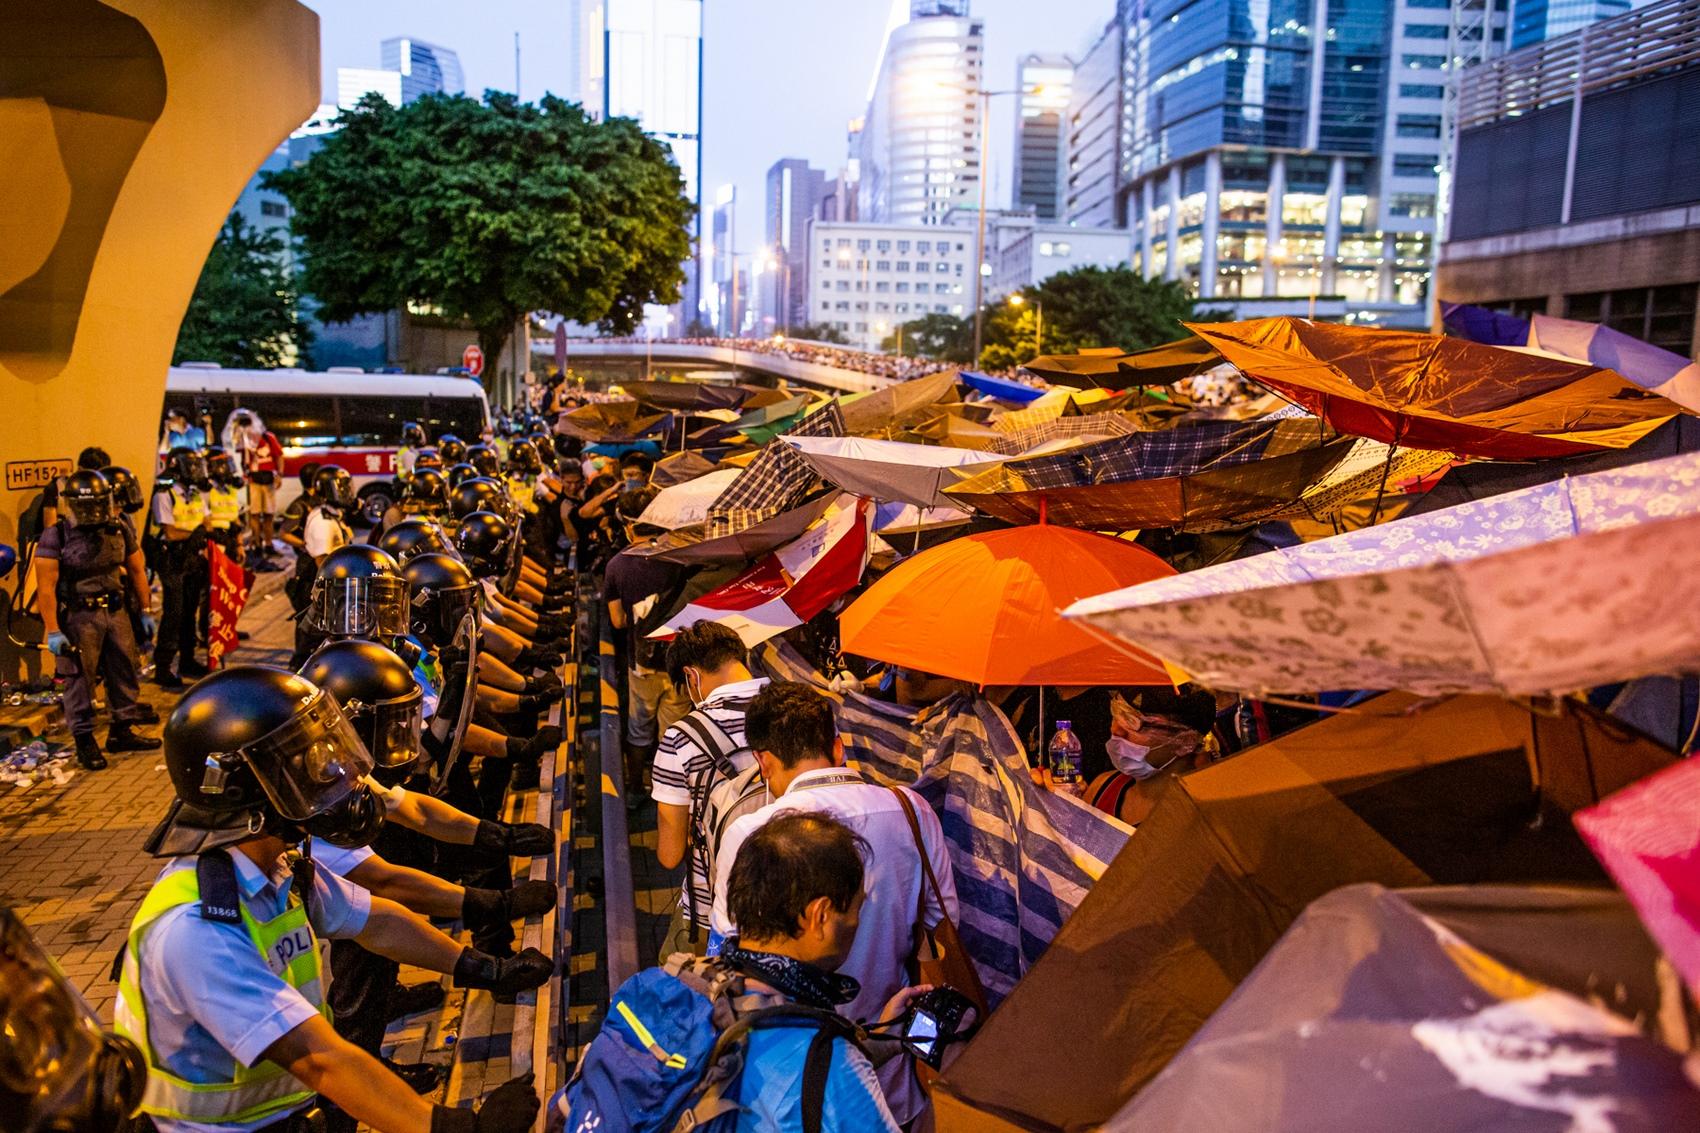 10_todd-r-sayang-dokumenter-fotografer-hong-kong-umbrella-movement-demokrasi-protes-hak asasi manusia